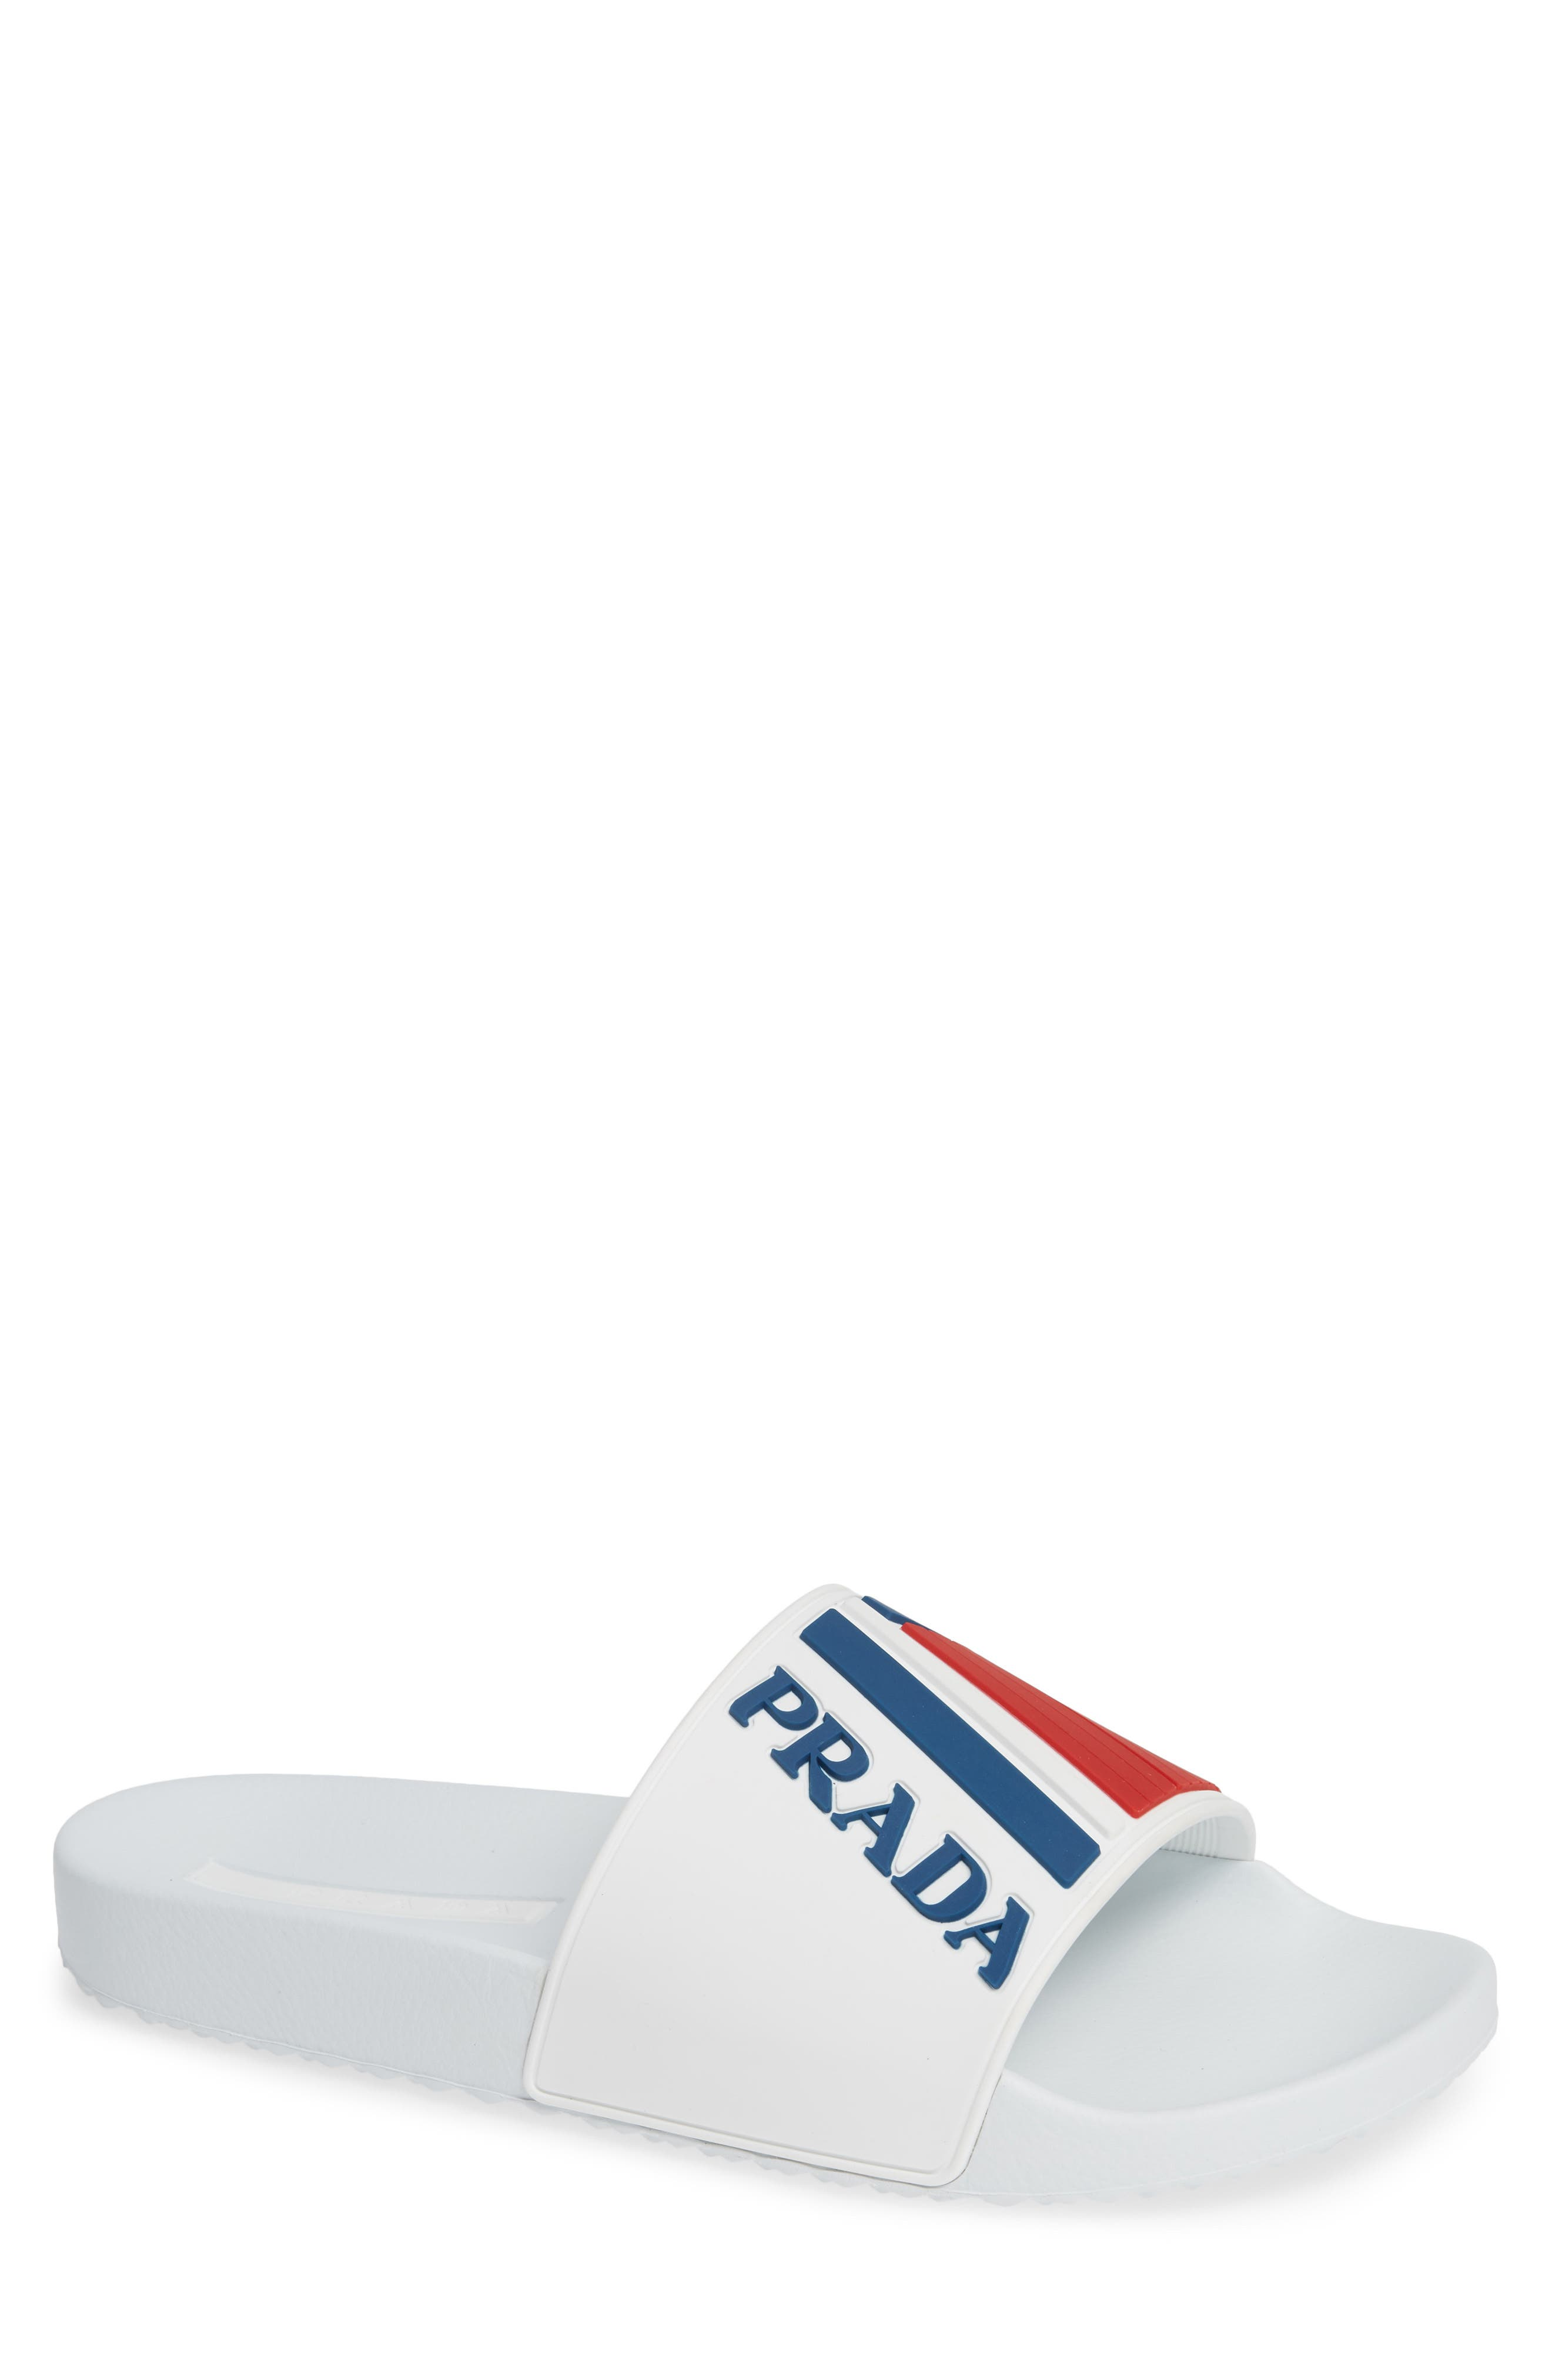 Linea Rossa Logo Slide Sandal,                             Main thumbnail 1, color,                             WHITE/ BLUE